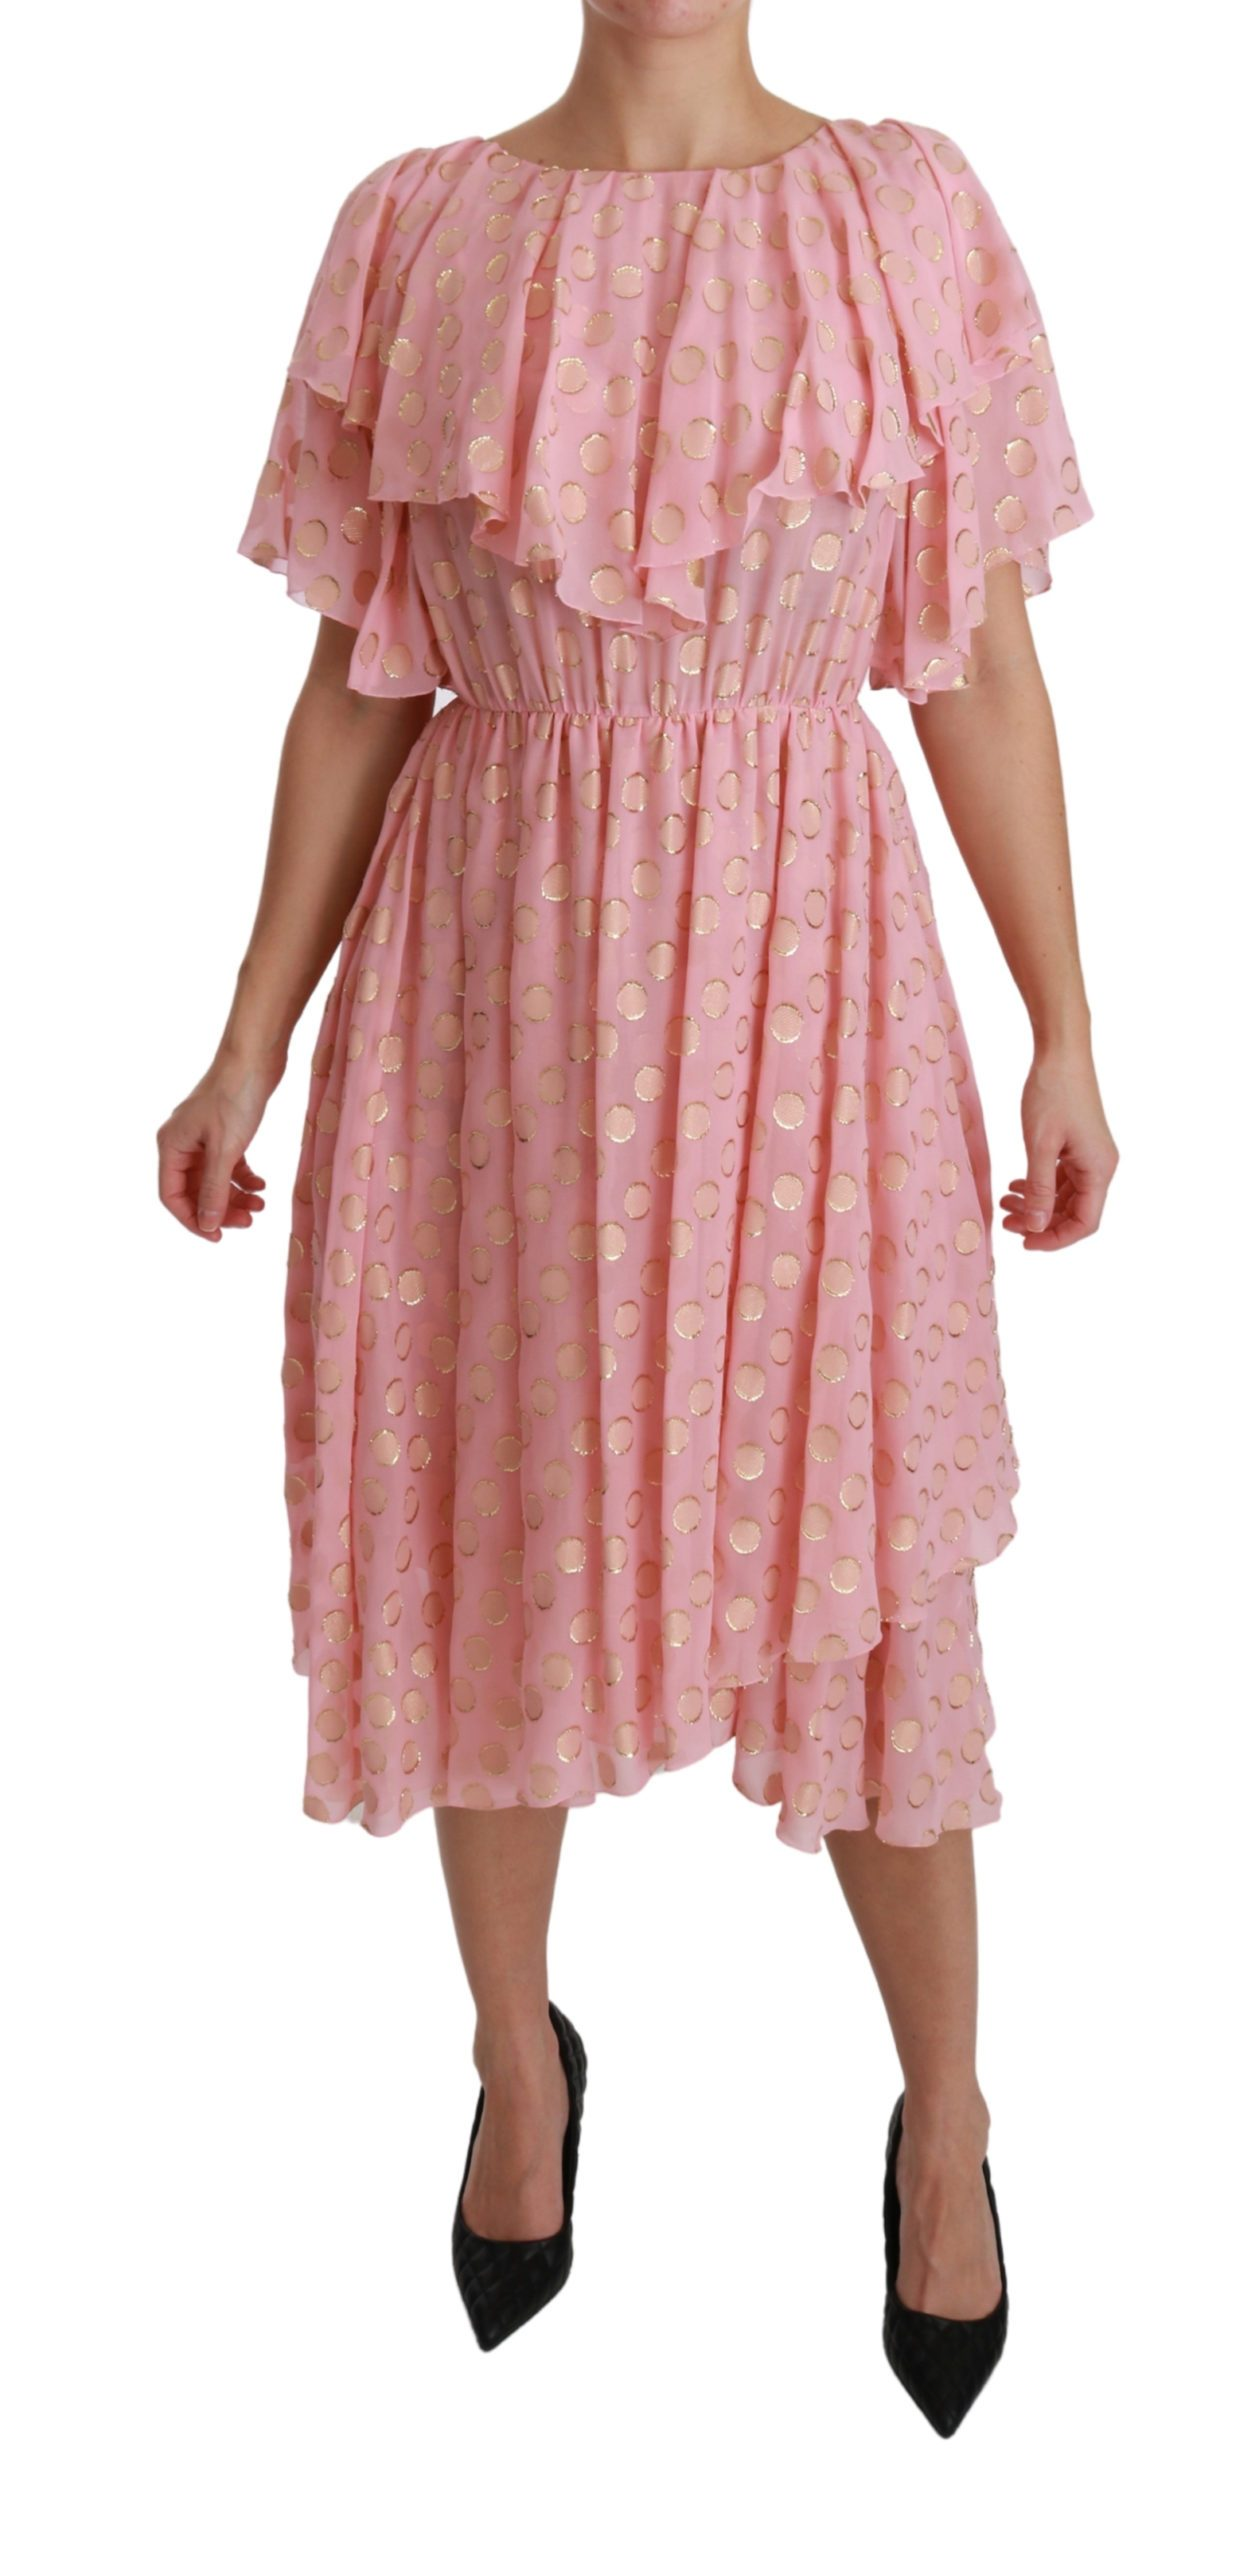 Dolce & Gabbana Women's Polka Dots Pleated A-line Midi Dress Pink DR2520 - IT40 S